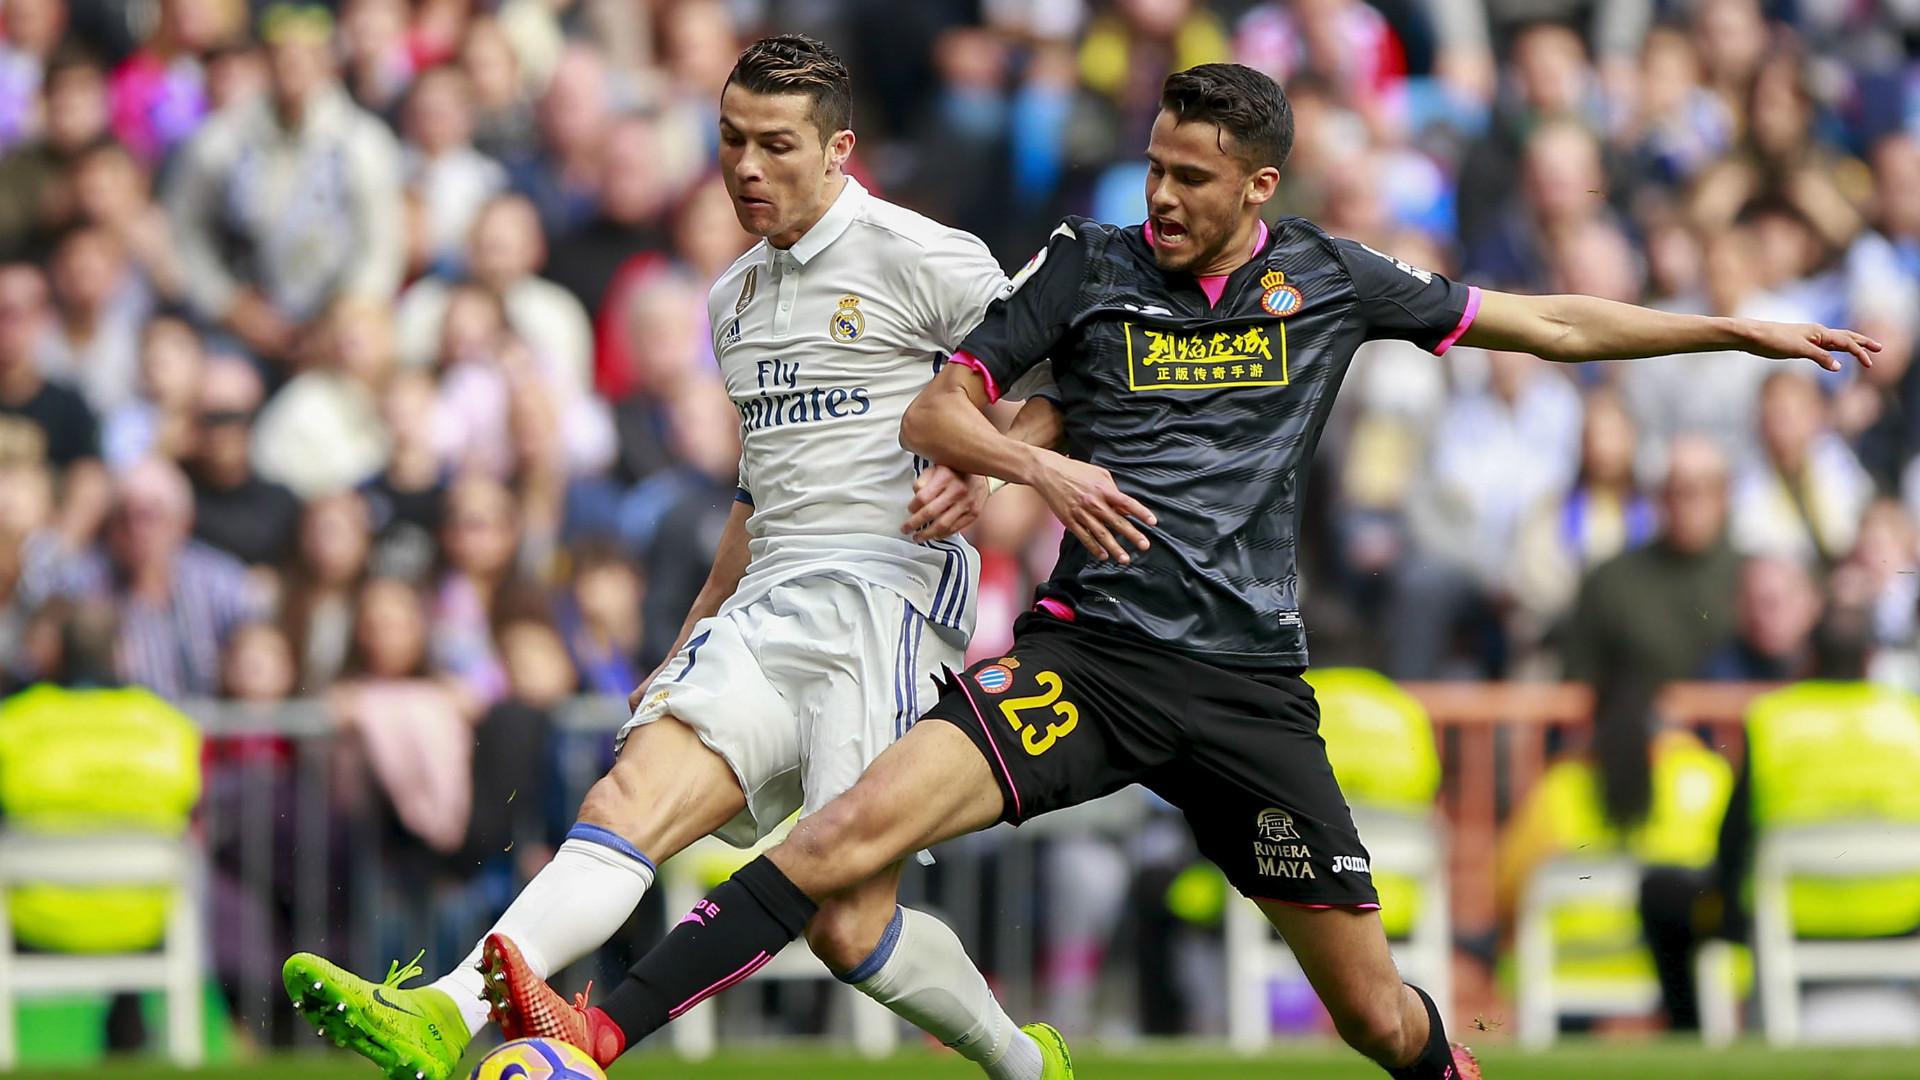 Diego Reyes Cristiano Ronaldo Real Madrid Espanyol Laliga Vs